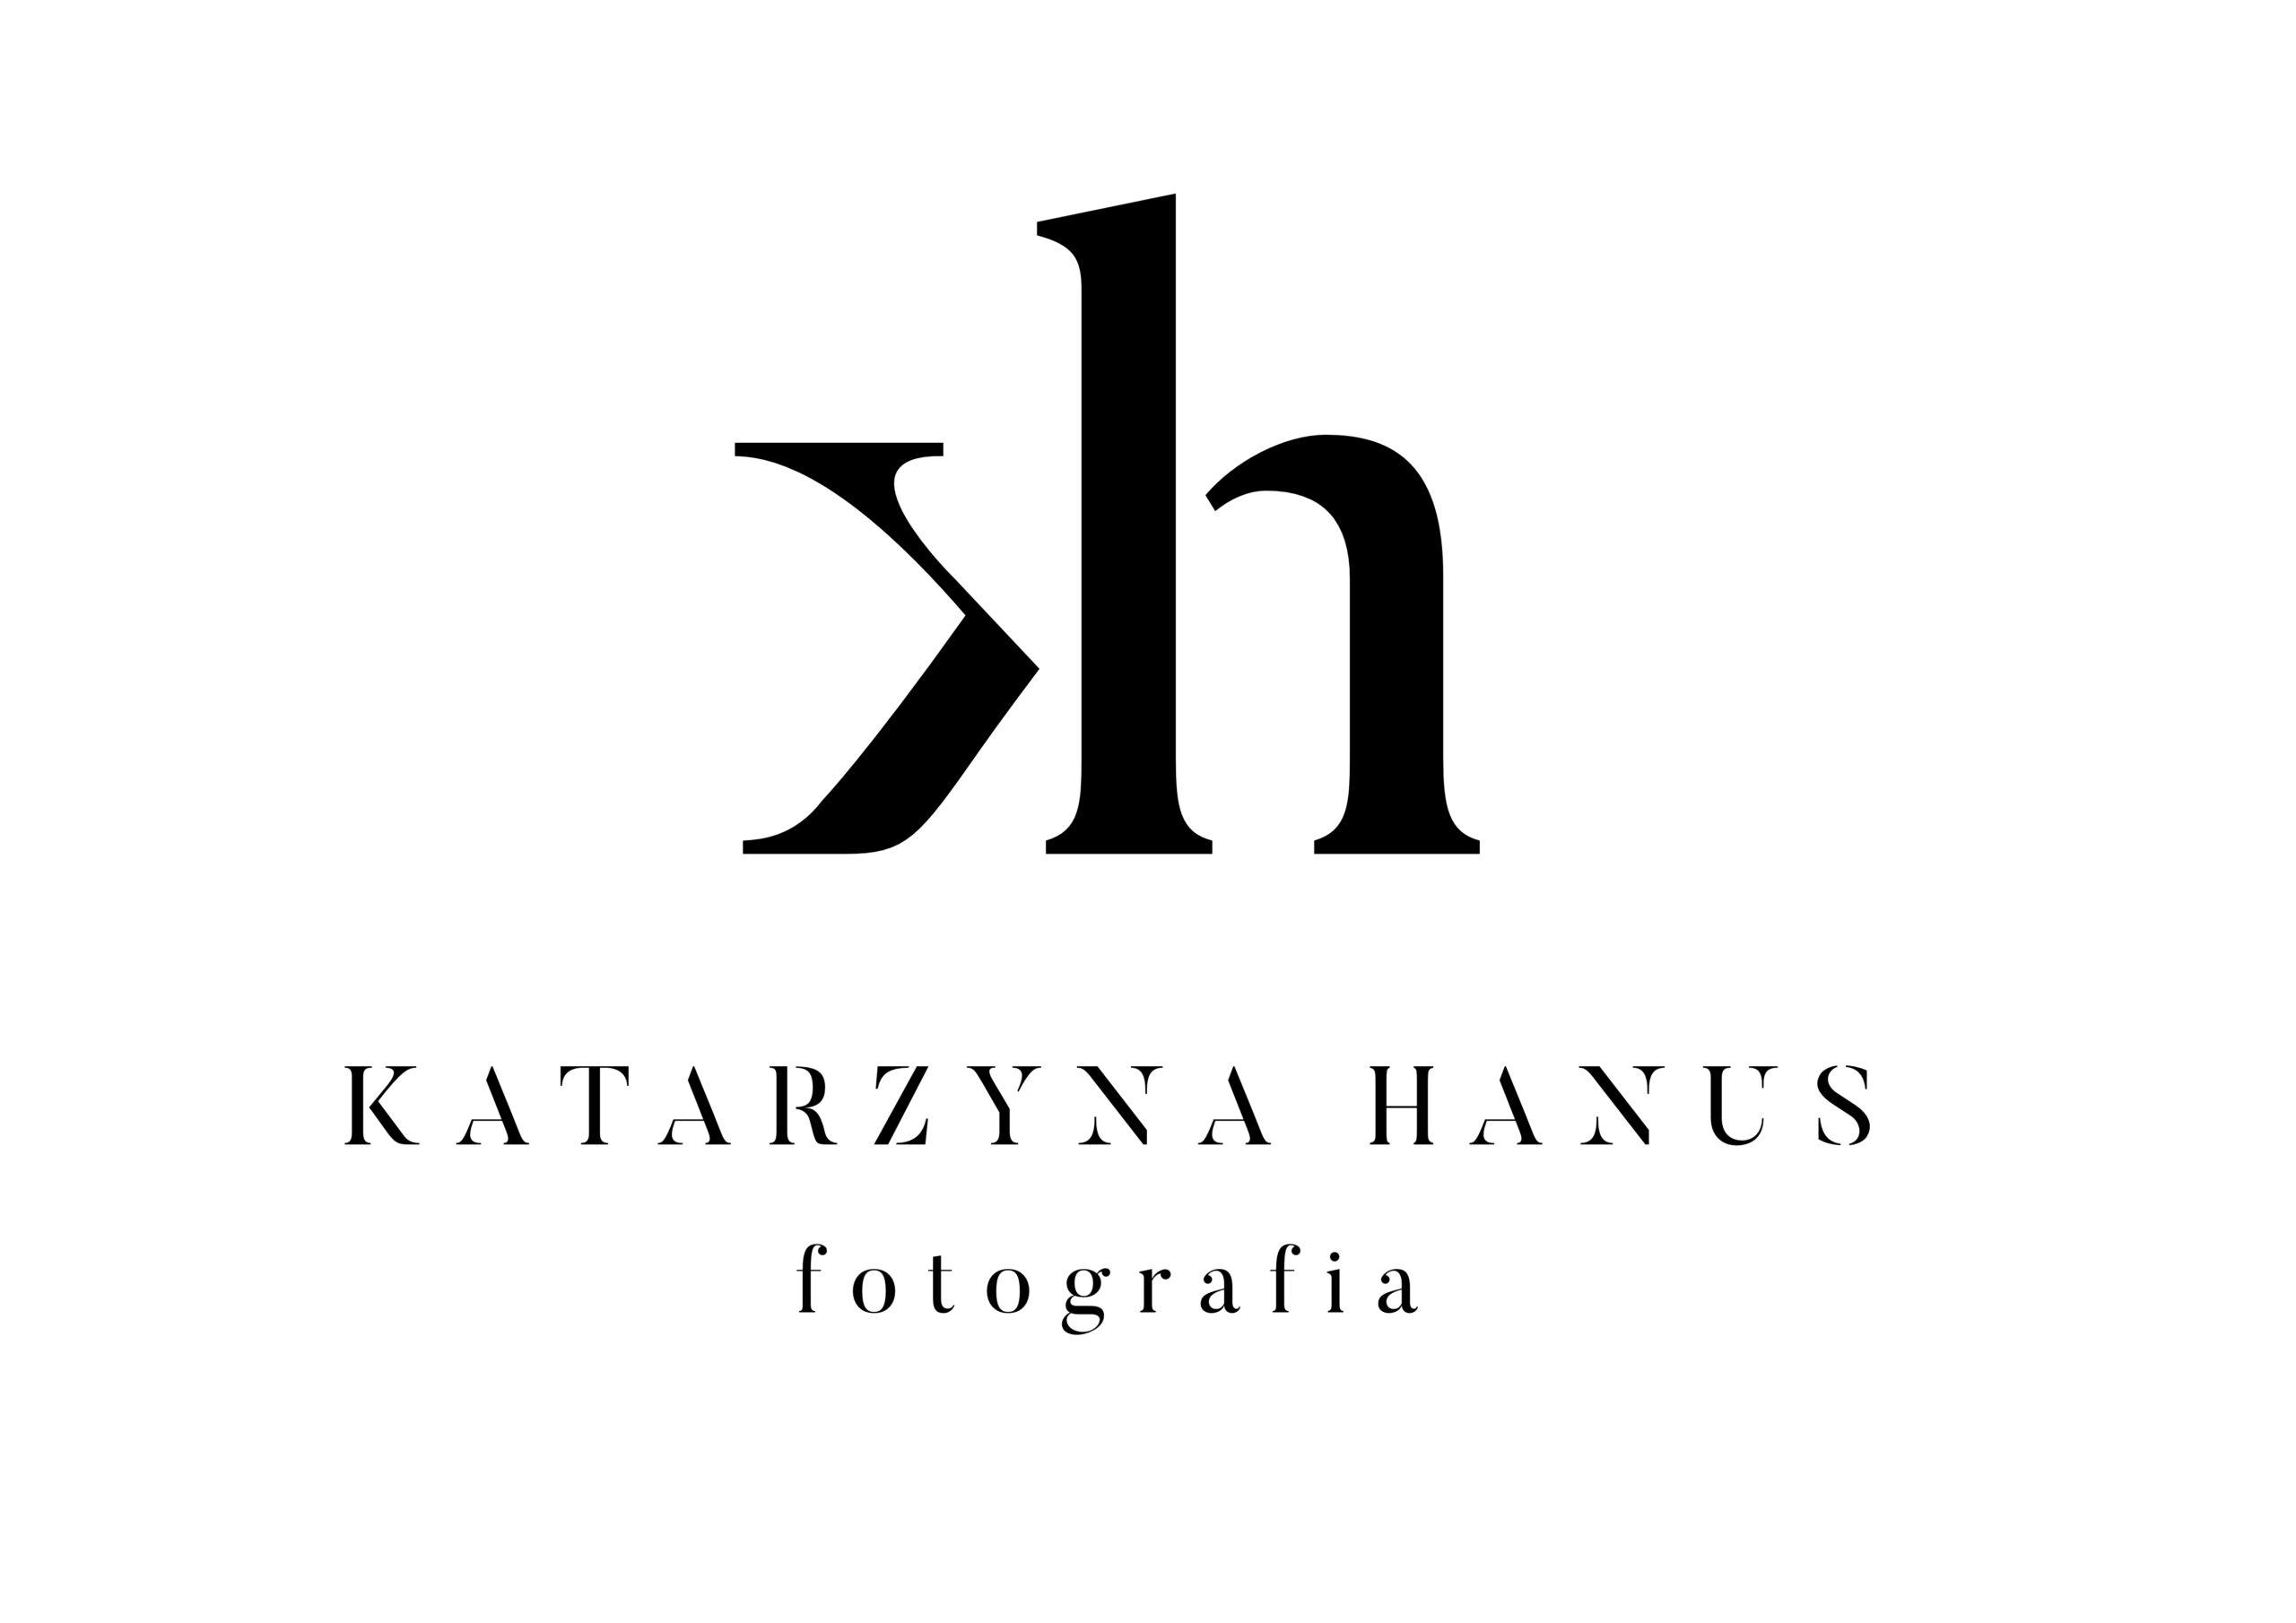 Katarzyna Hanus